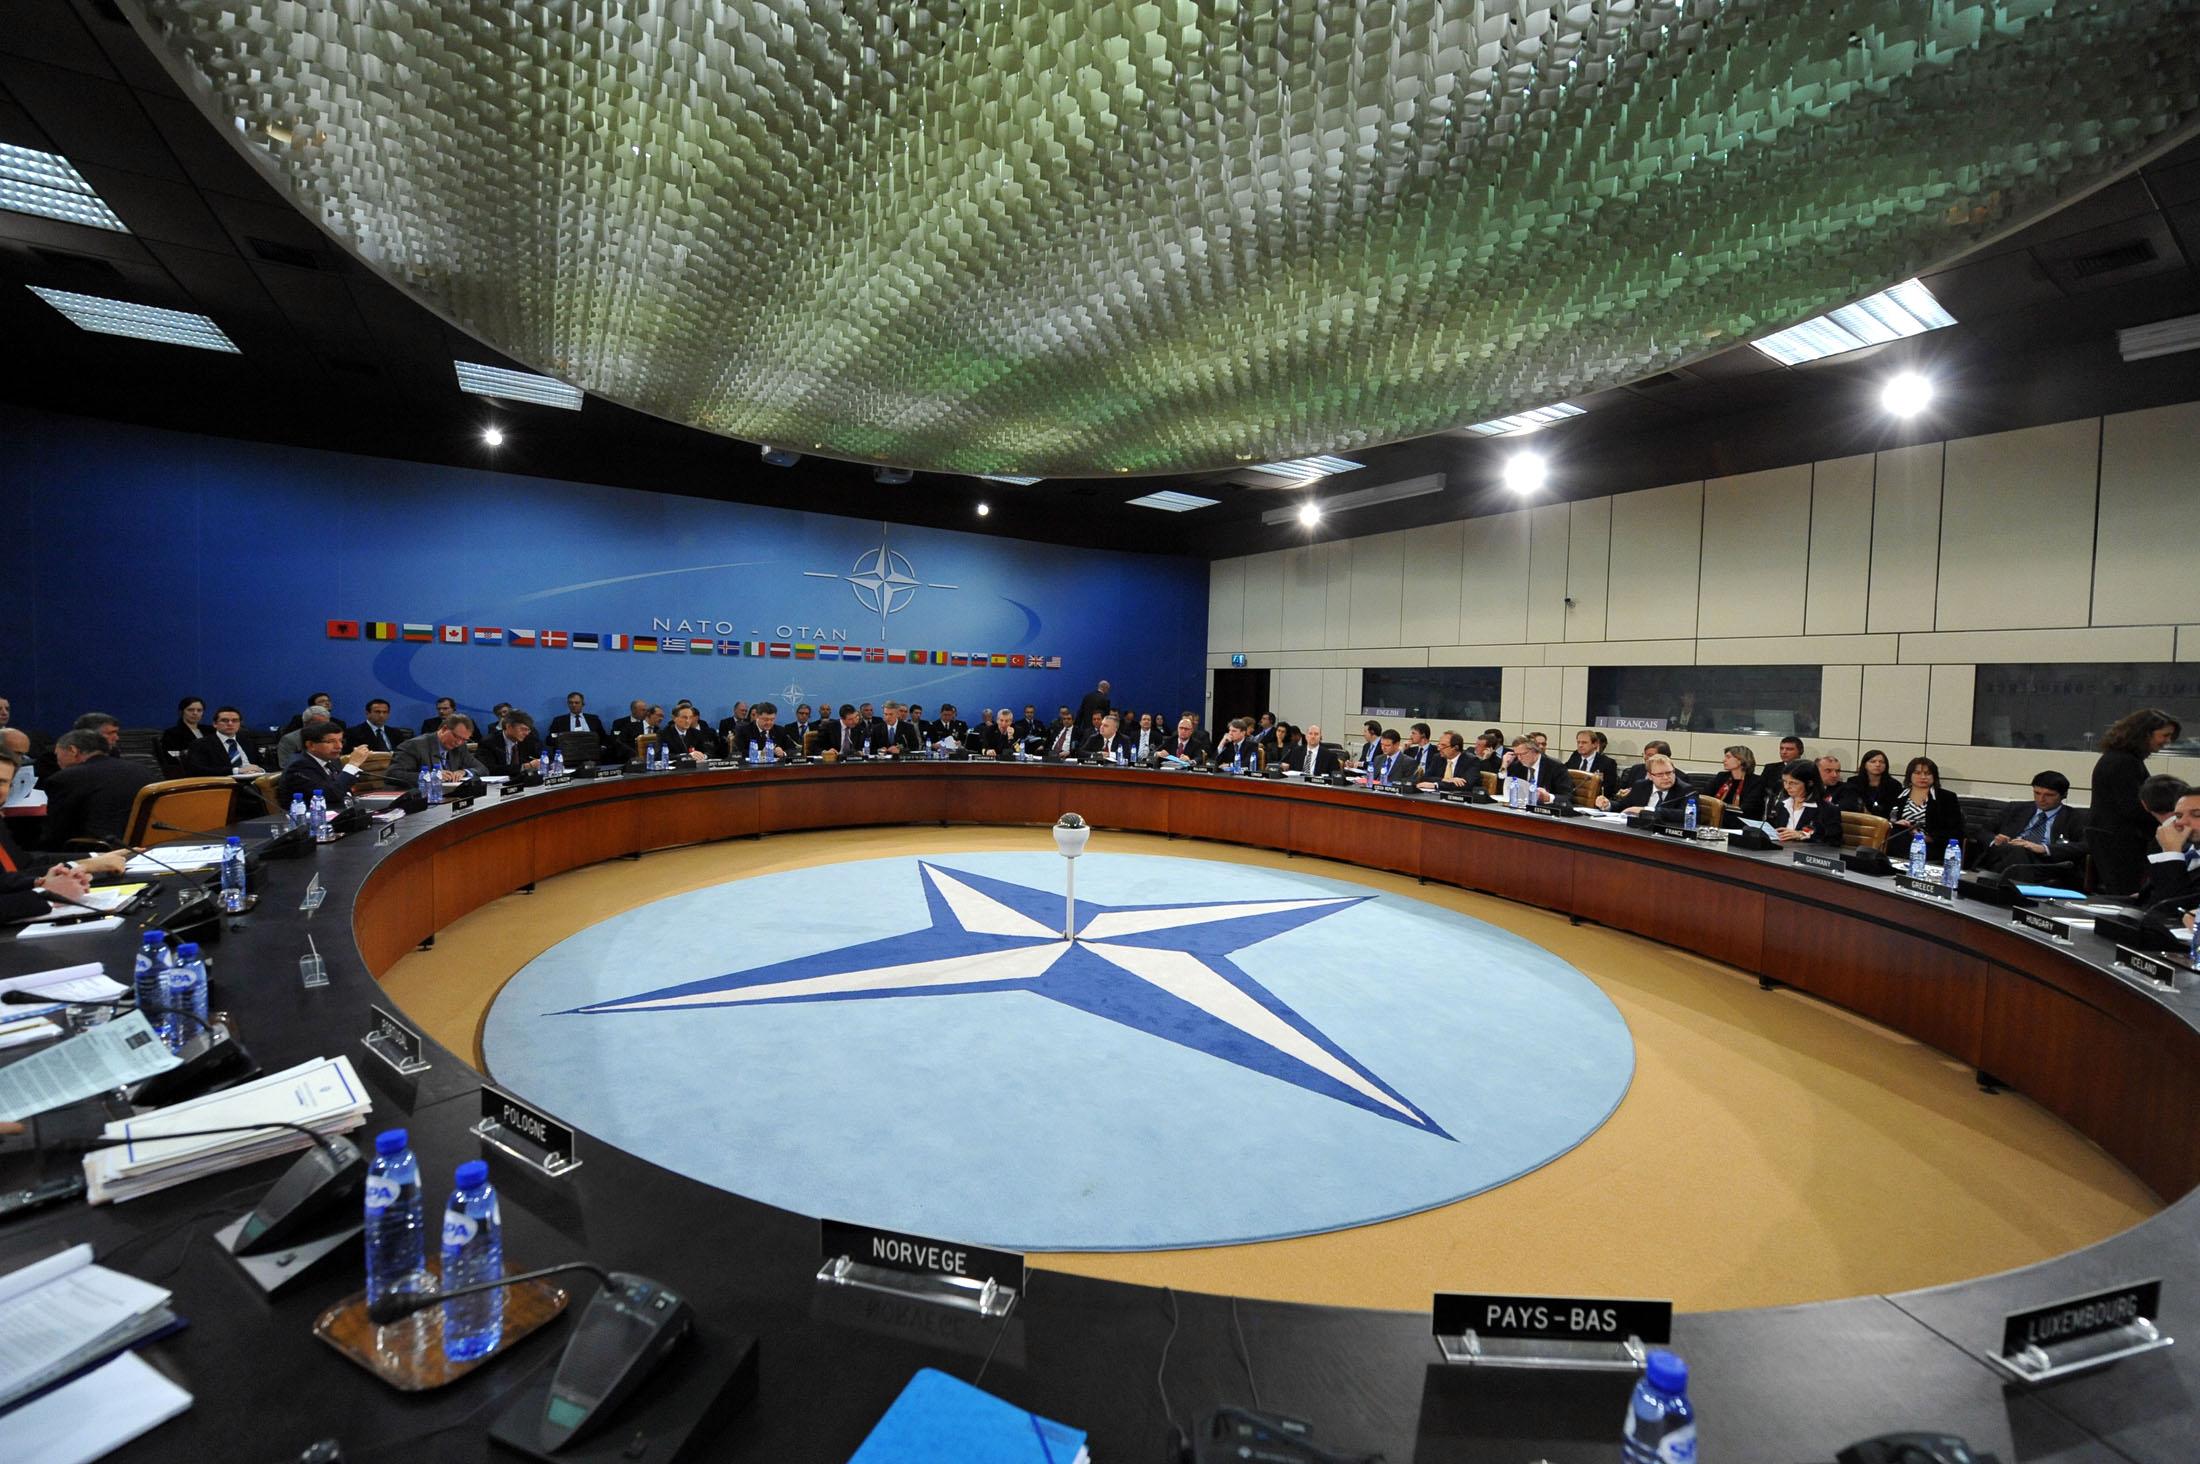 Crotatia, Montenegro and NATO sign air traffic agreement